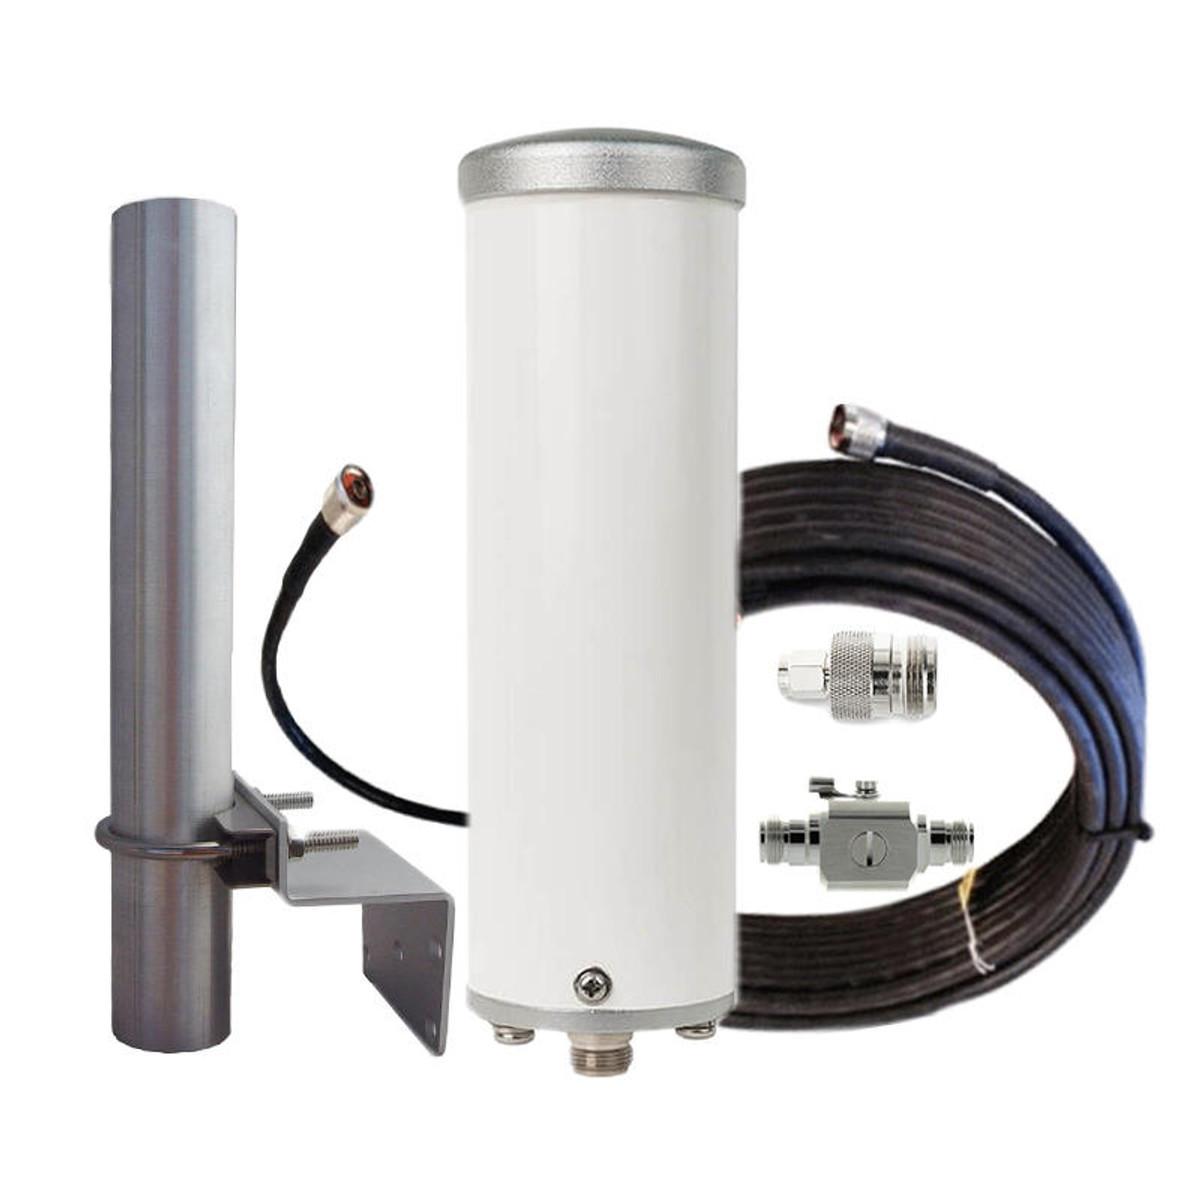 Hotspot SMA Omni Antenna Expansion Kit